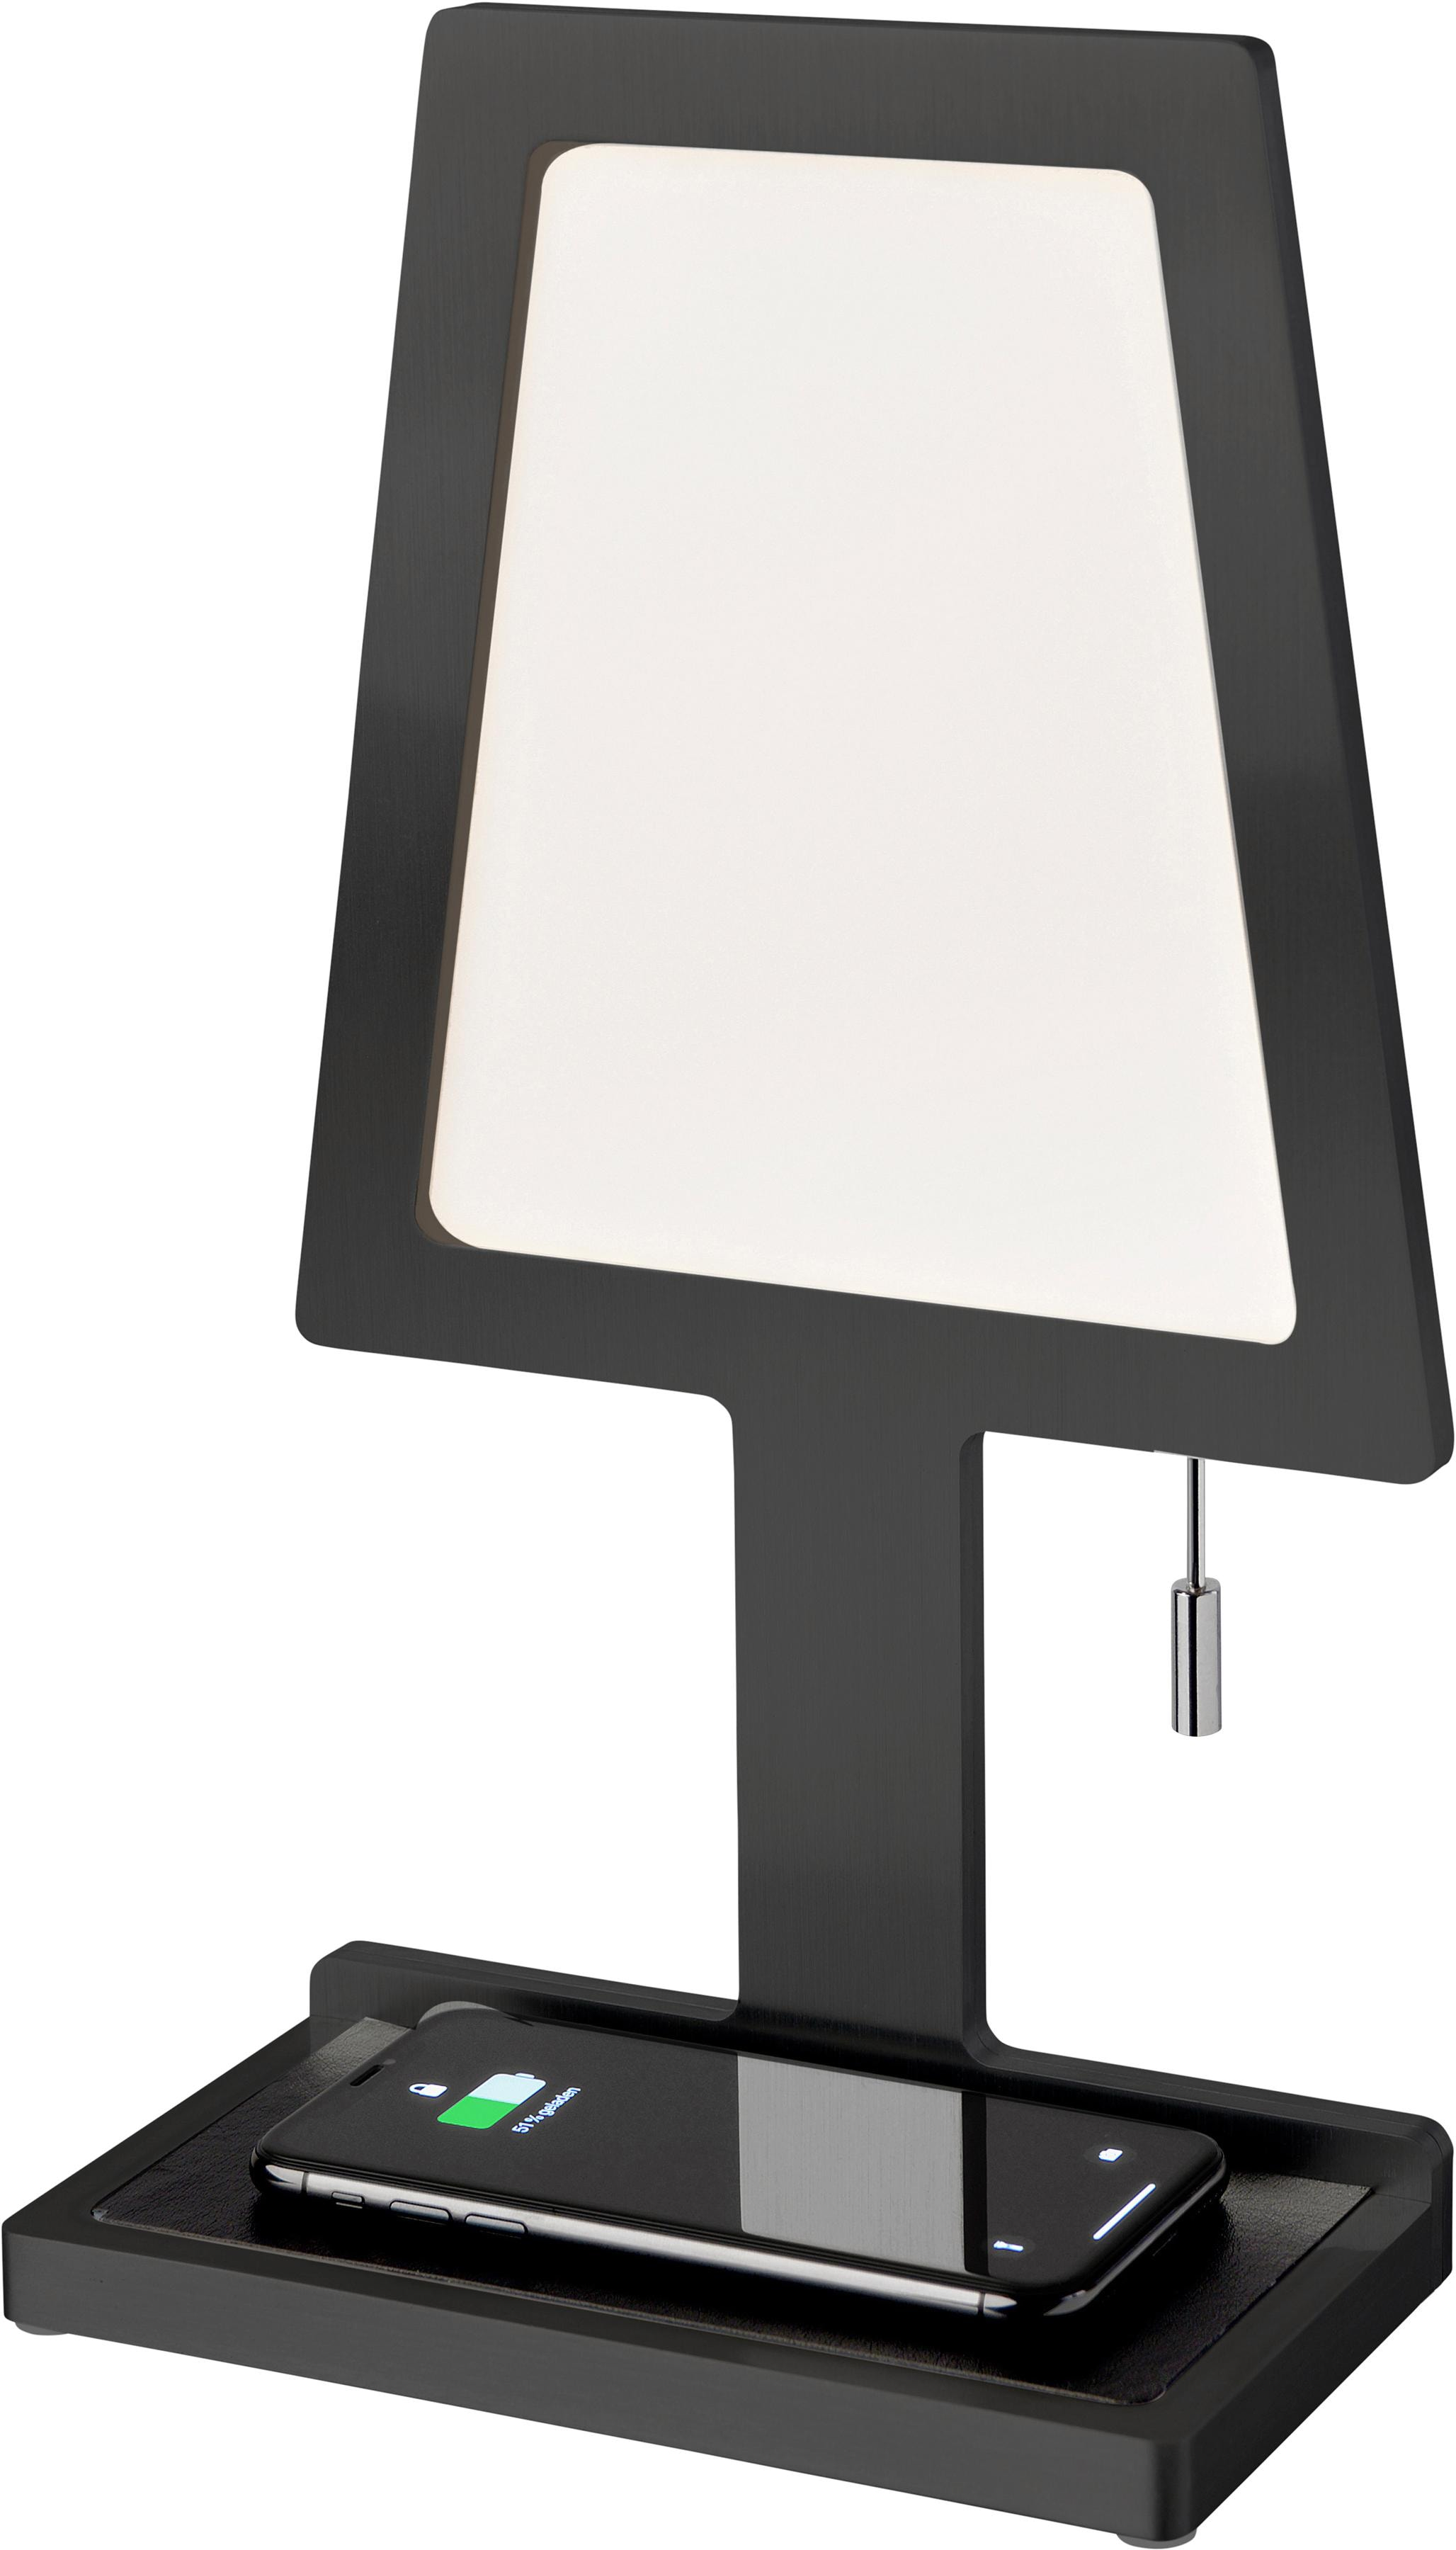 SOMPEX LED Tischleuchte Steve-Phone, LED-Board, Warmweiß, mit induktiver Ladefunktion, gemäß QI-Standard